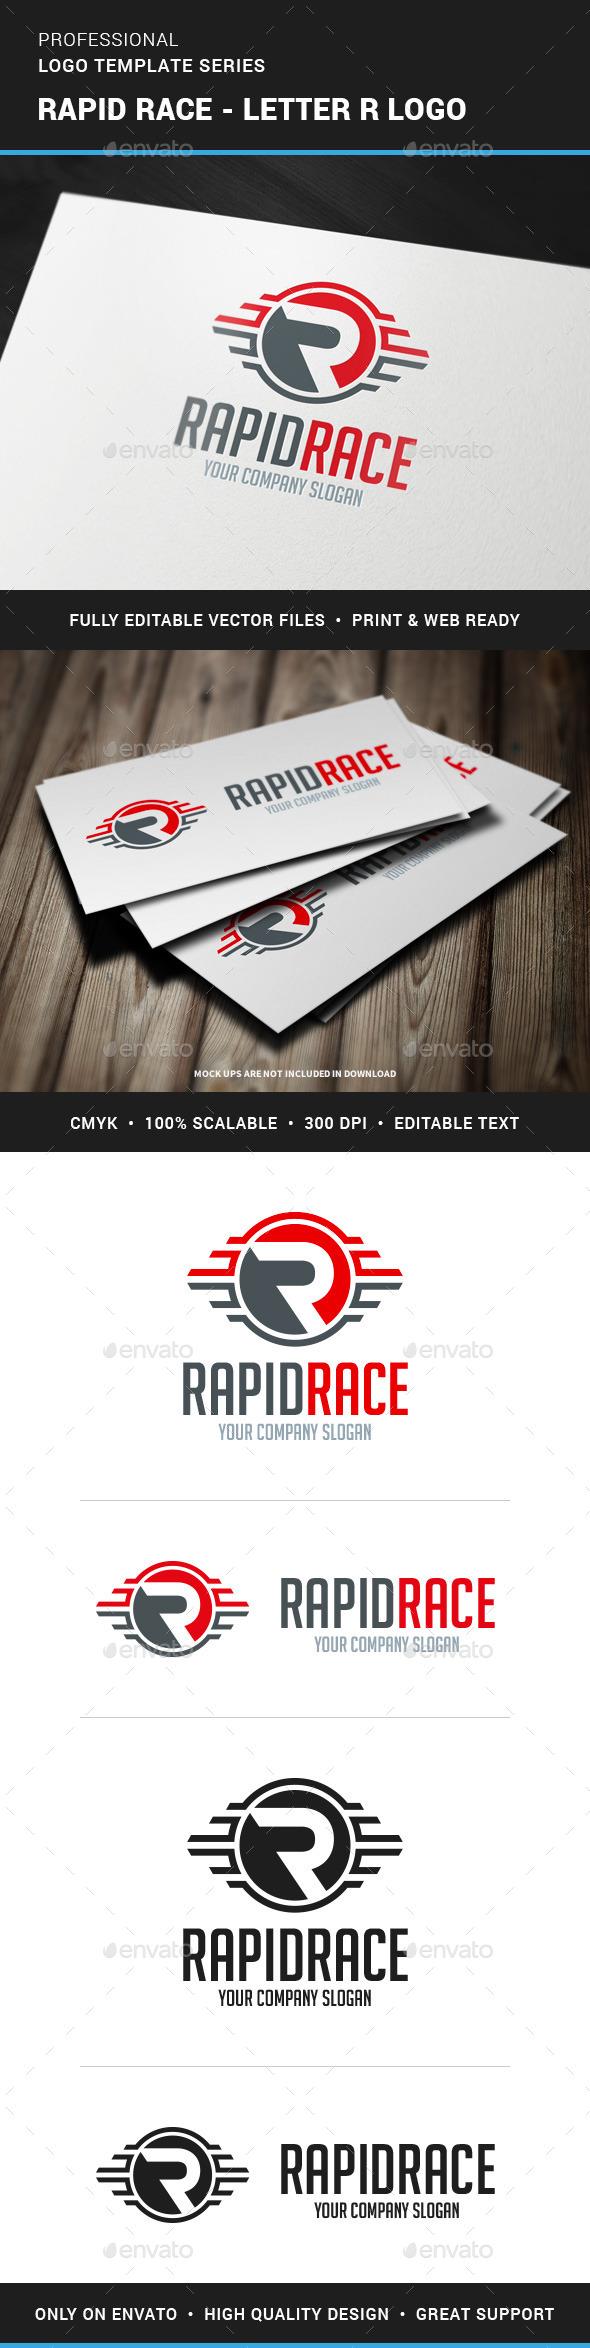 Rapid Race Letter R Logo